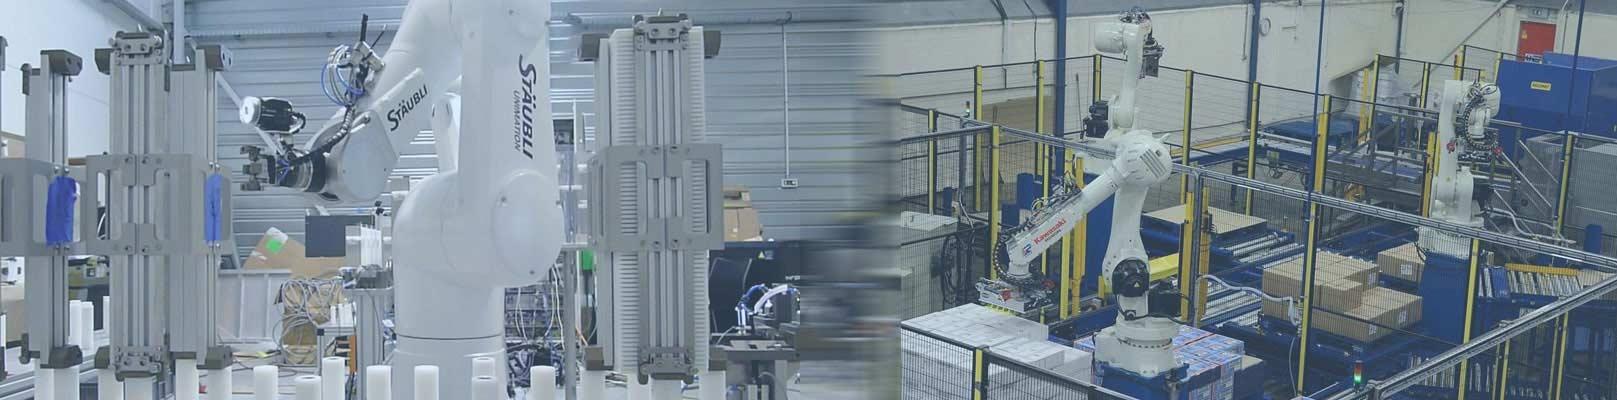 Intégration Robotique - EDMR Engineering